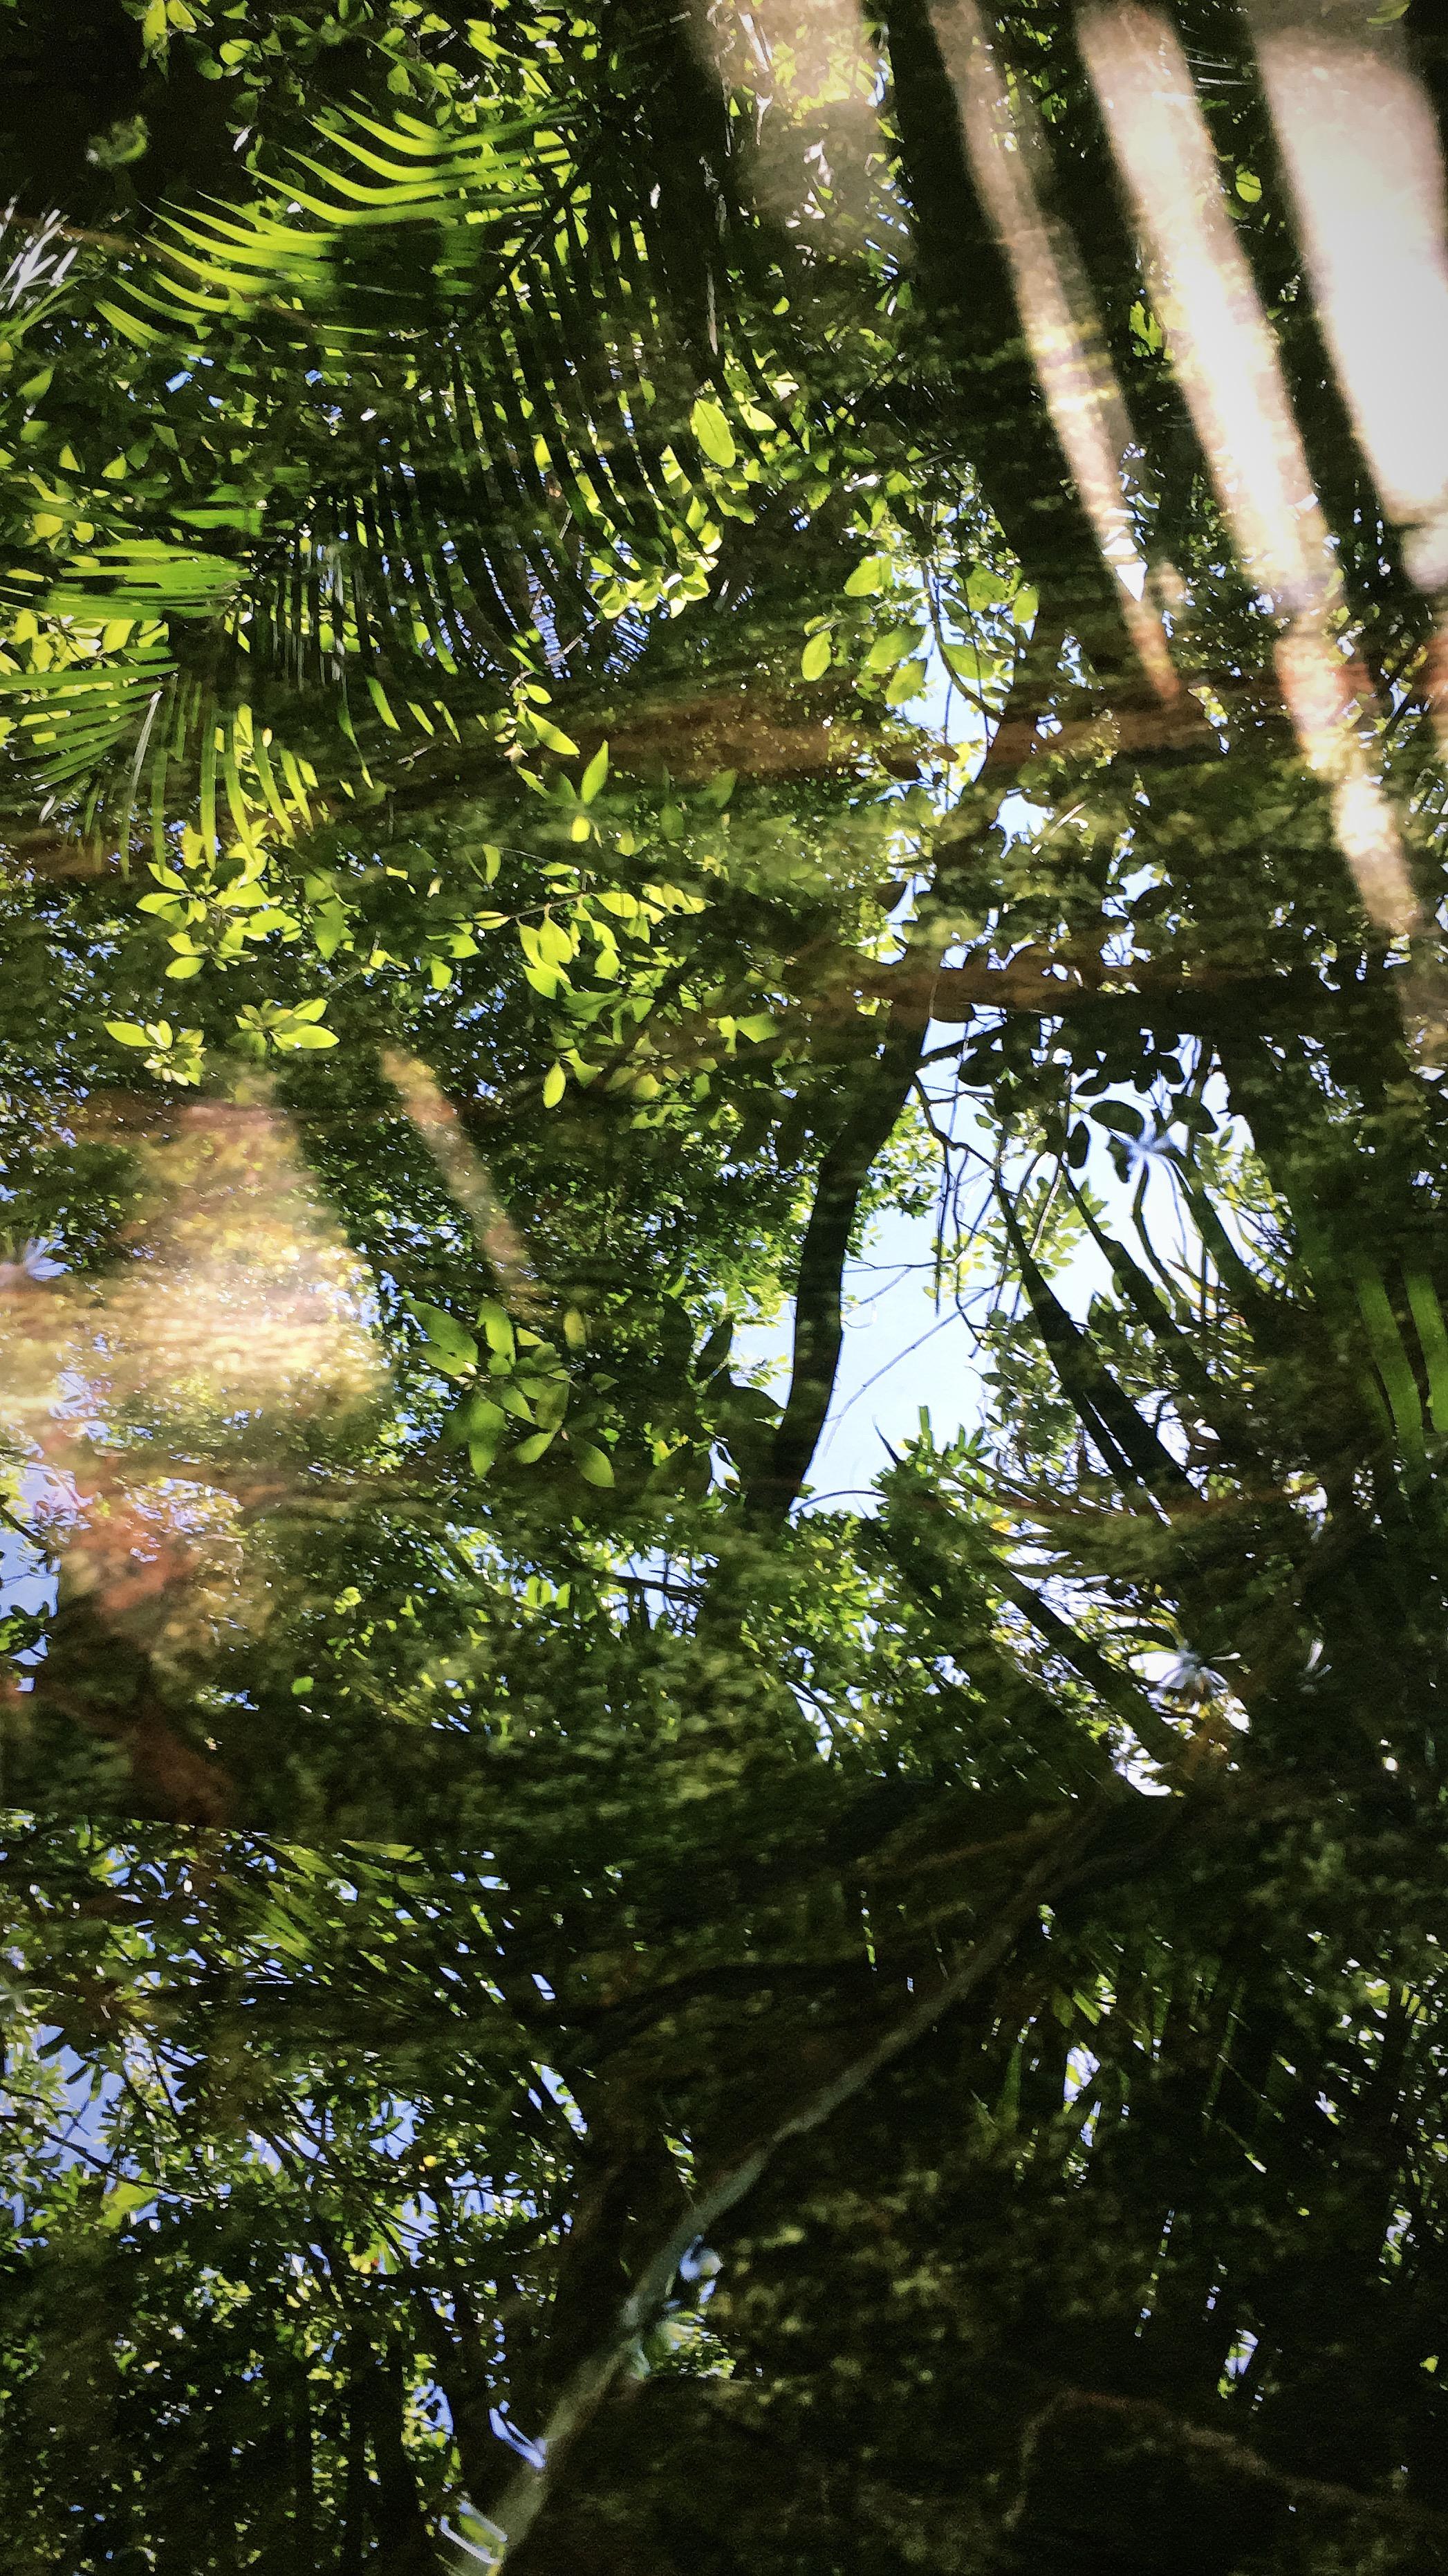 enchanting-transformation-water-treatment